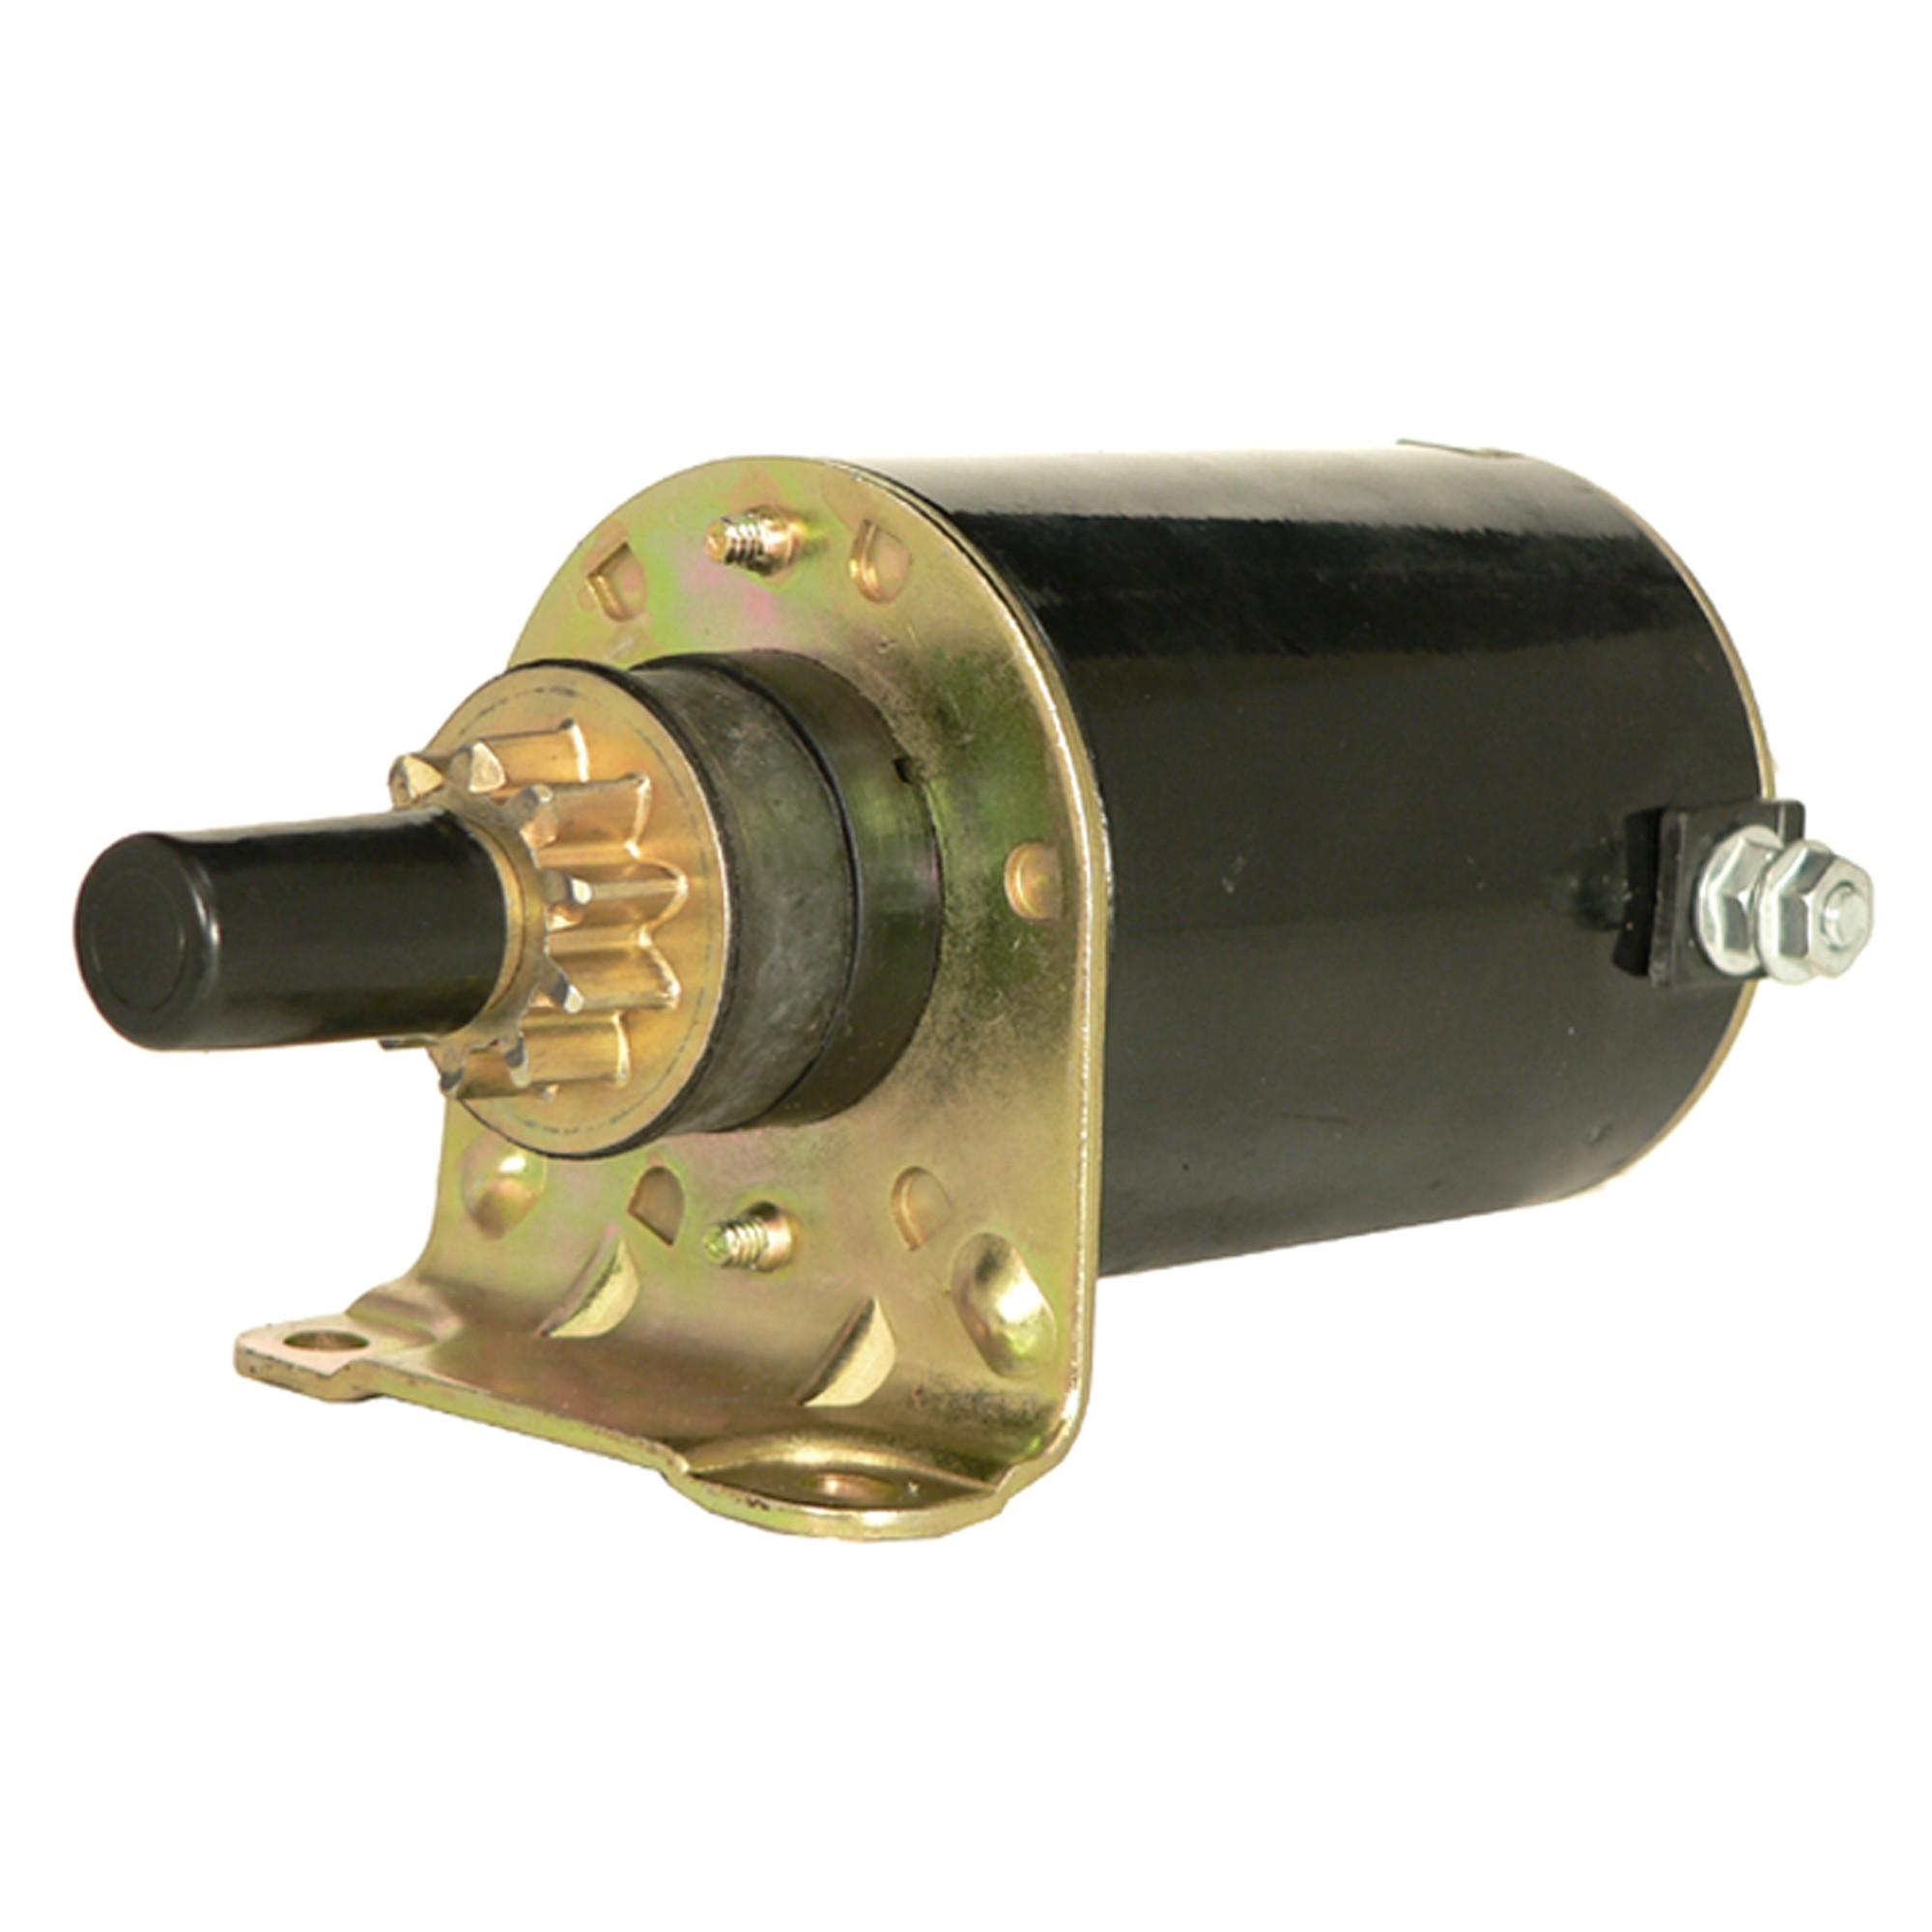 DB Electrical SAB0126 New Starter For Kawasaki John Deere Mia11564 Fh430V 21163-7007 X300 X300R X304 With Kawasaki 17Hp 410-21063 103866 21163-7031,Fh381V Miu11006 Fh480V Engine Power Equipment